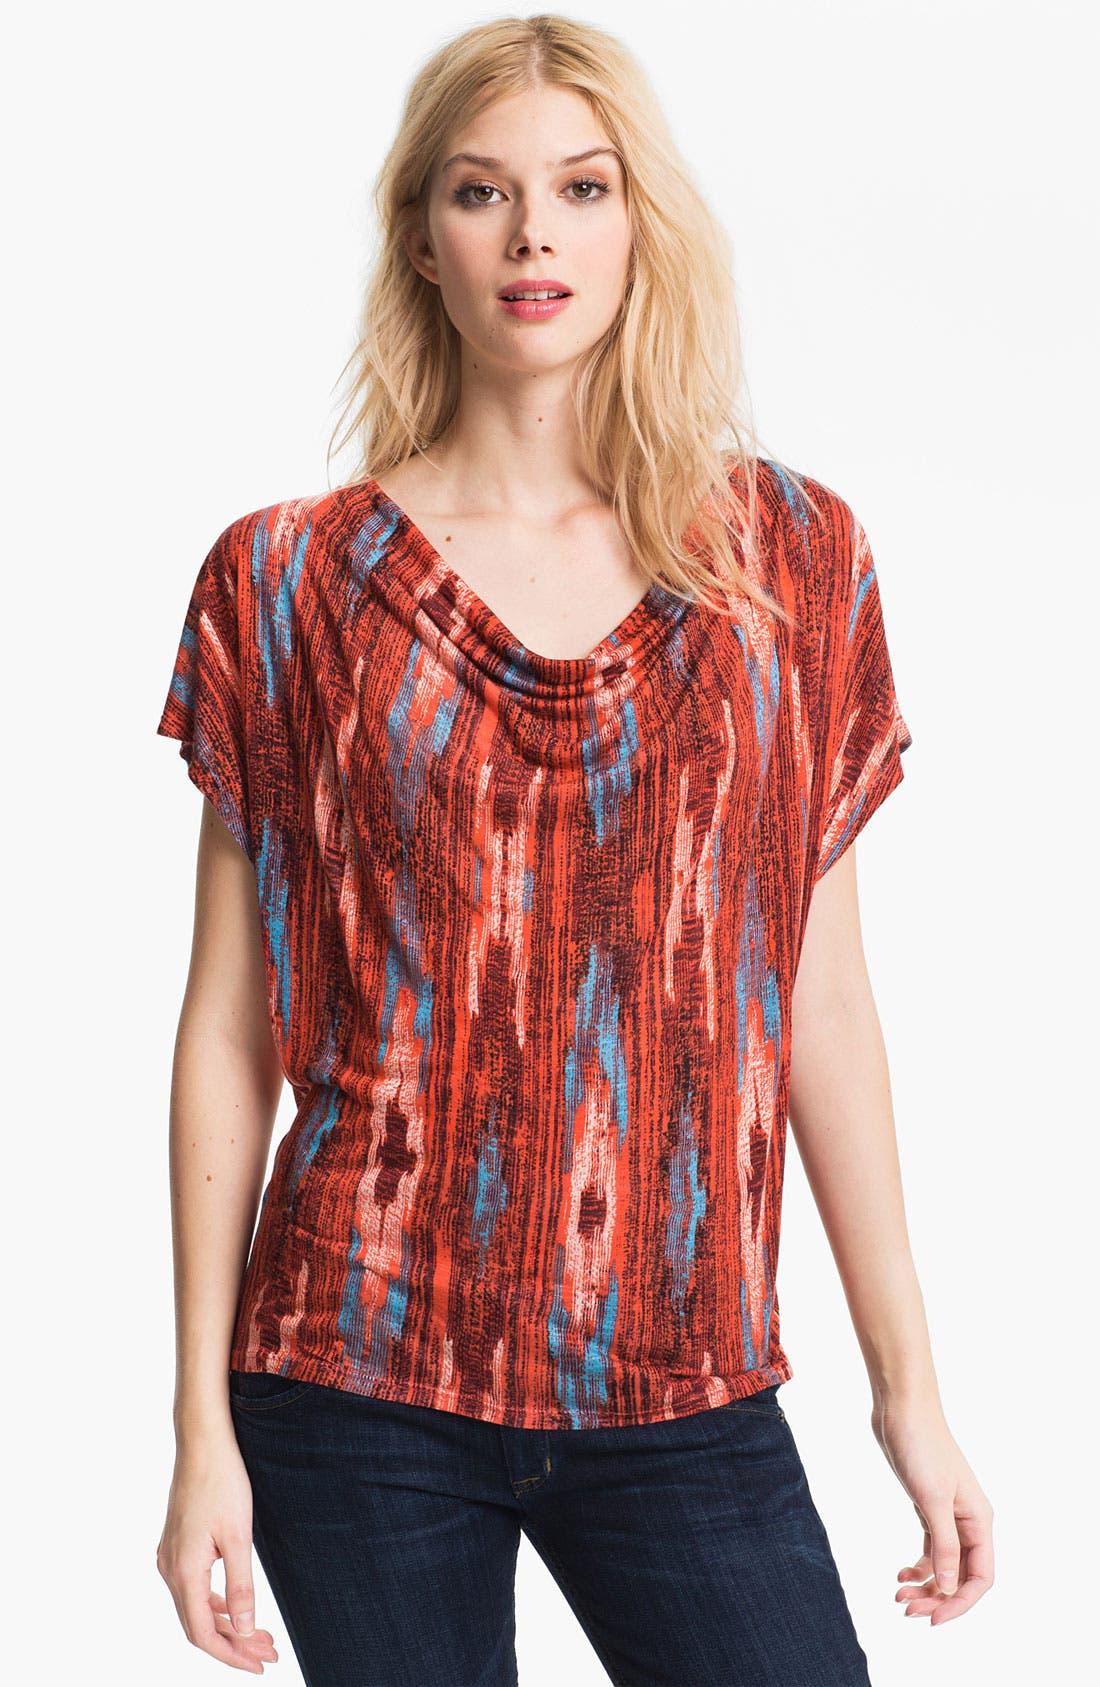 Alternate Image 1 Selected - Ella Moss 'Santa Fe' Print Cowl Neck Top